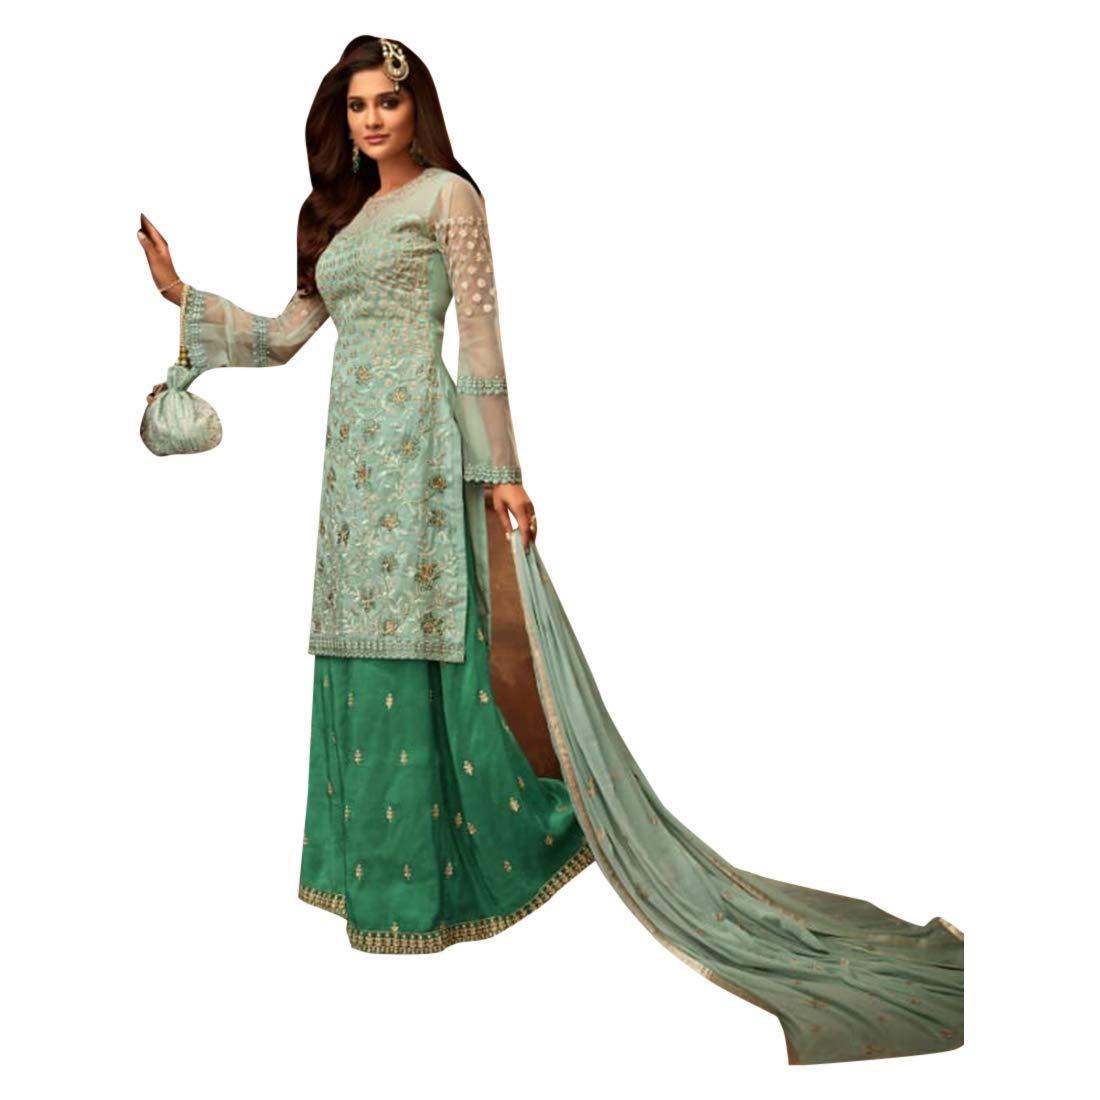 Stylish Festive wear Designer Sharara Salwar Kameez Suit with Heavy Embroidery Ethnic Muslim dress 7748